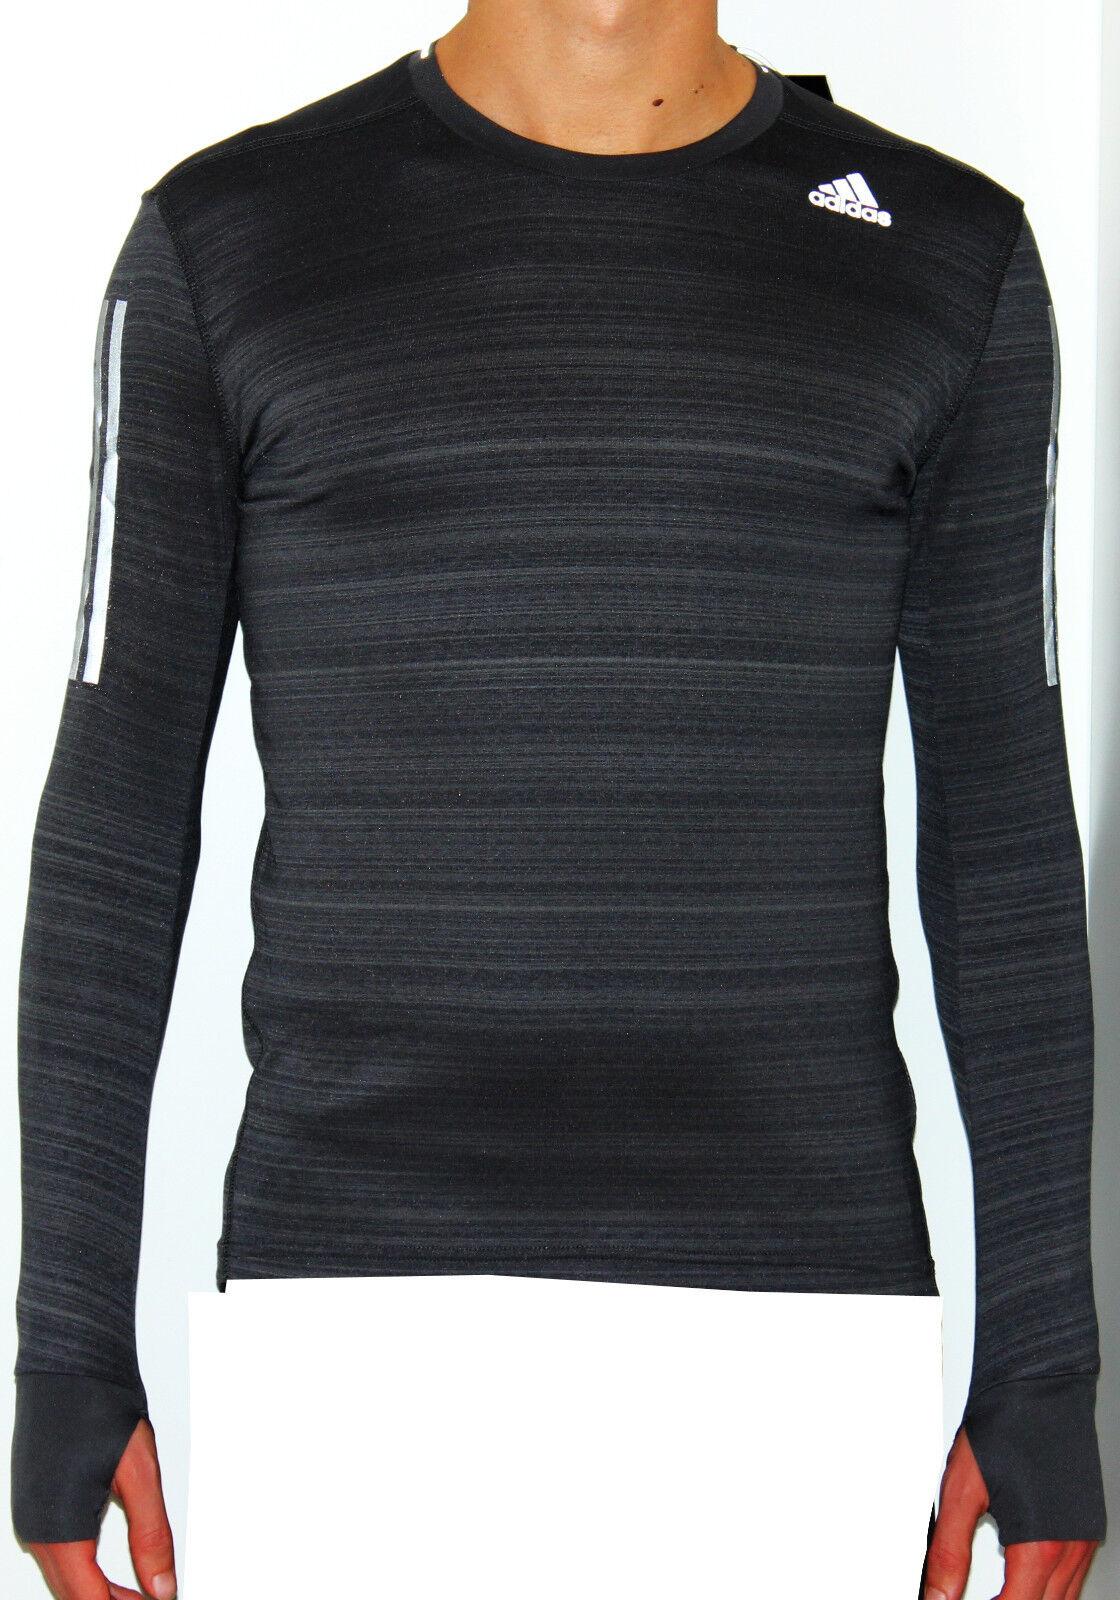 Adidas Climacool Jogging Fußball Langarmshirt mit Daumenöffnung S16240 Gr. S-XL